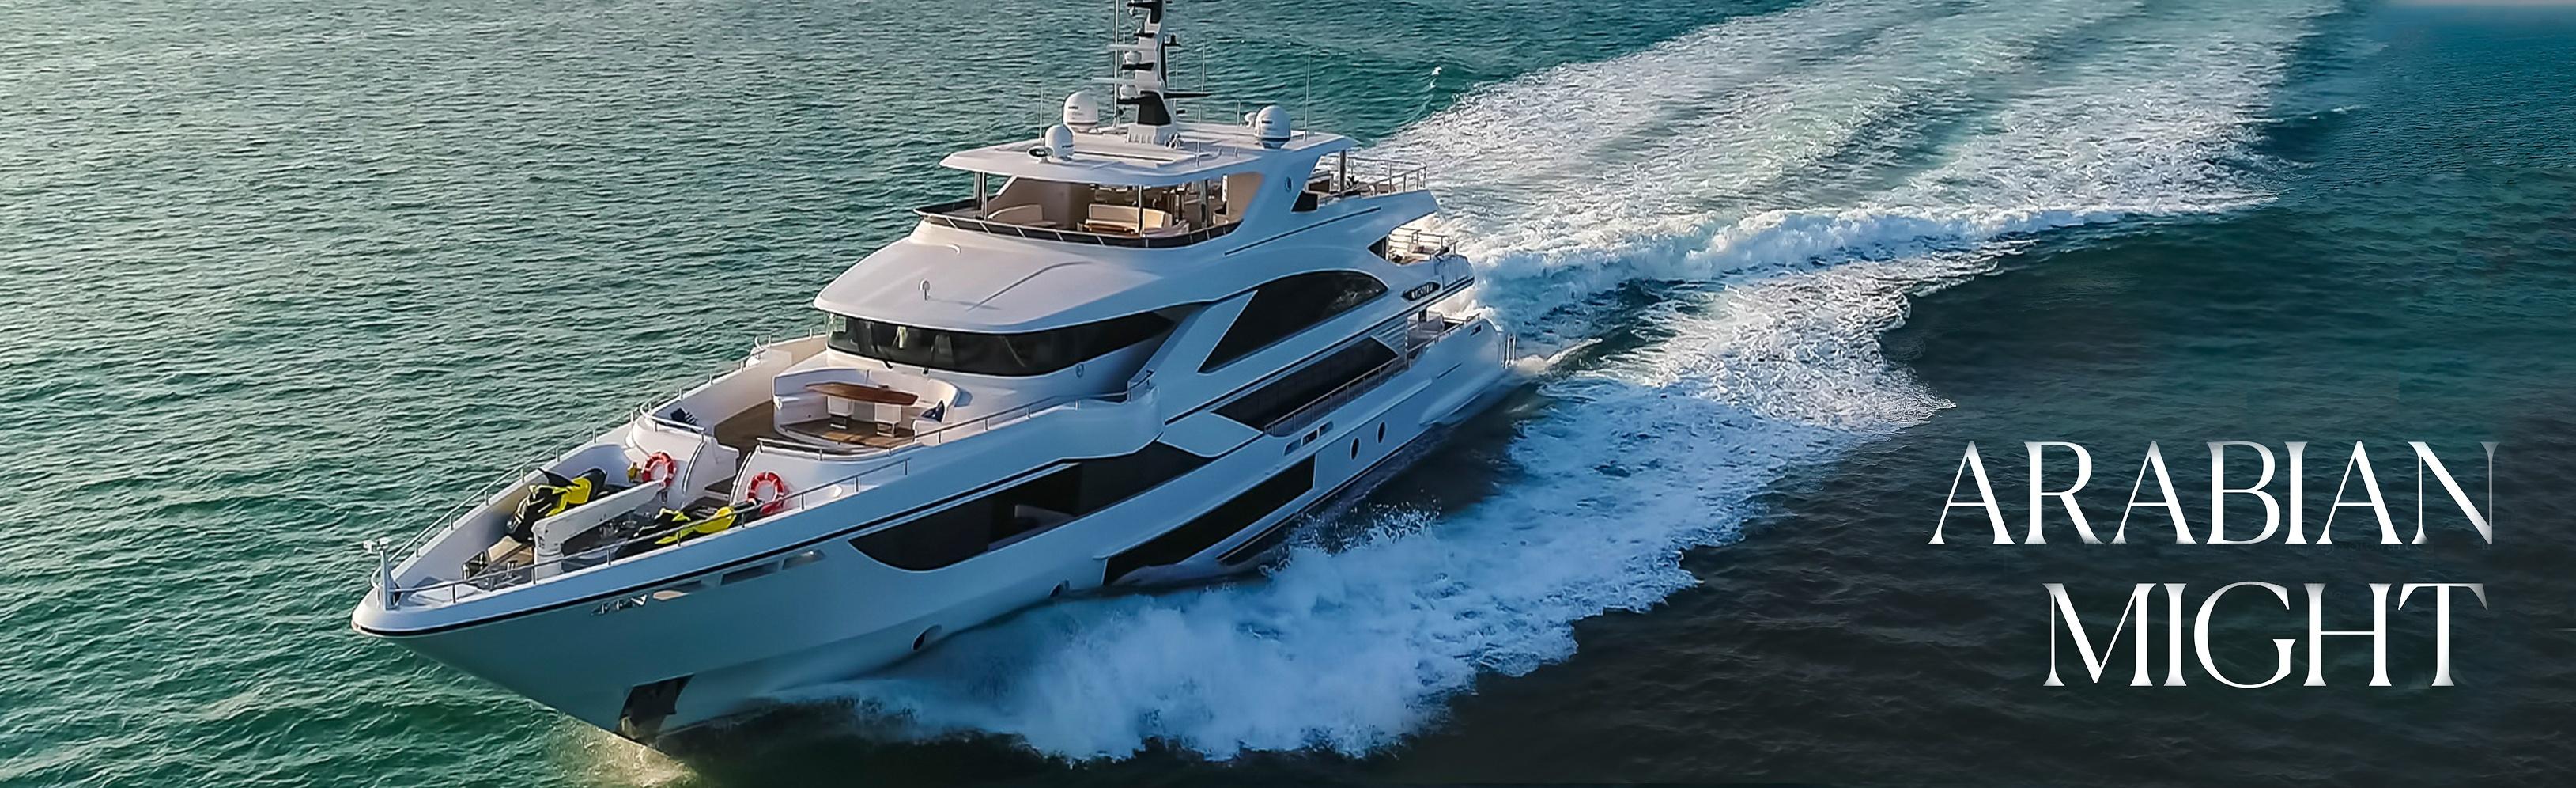 Majesty-140-Boat-International-2